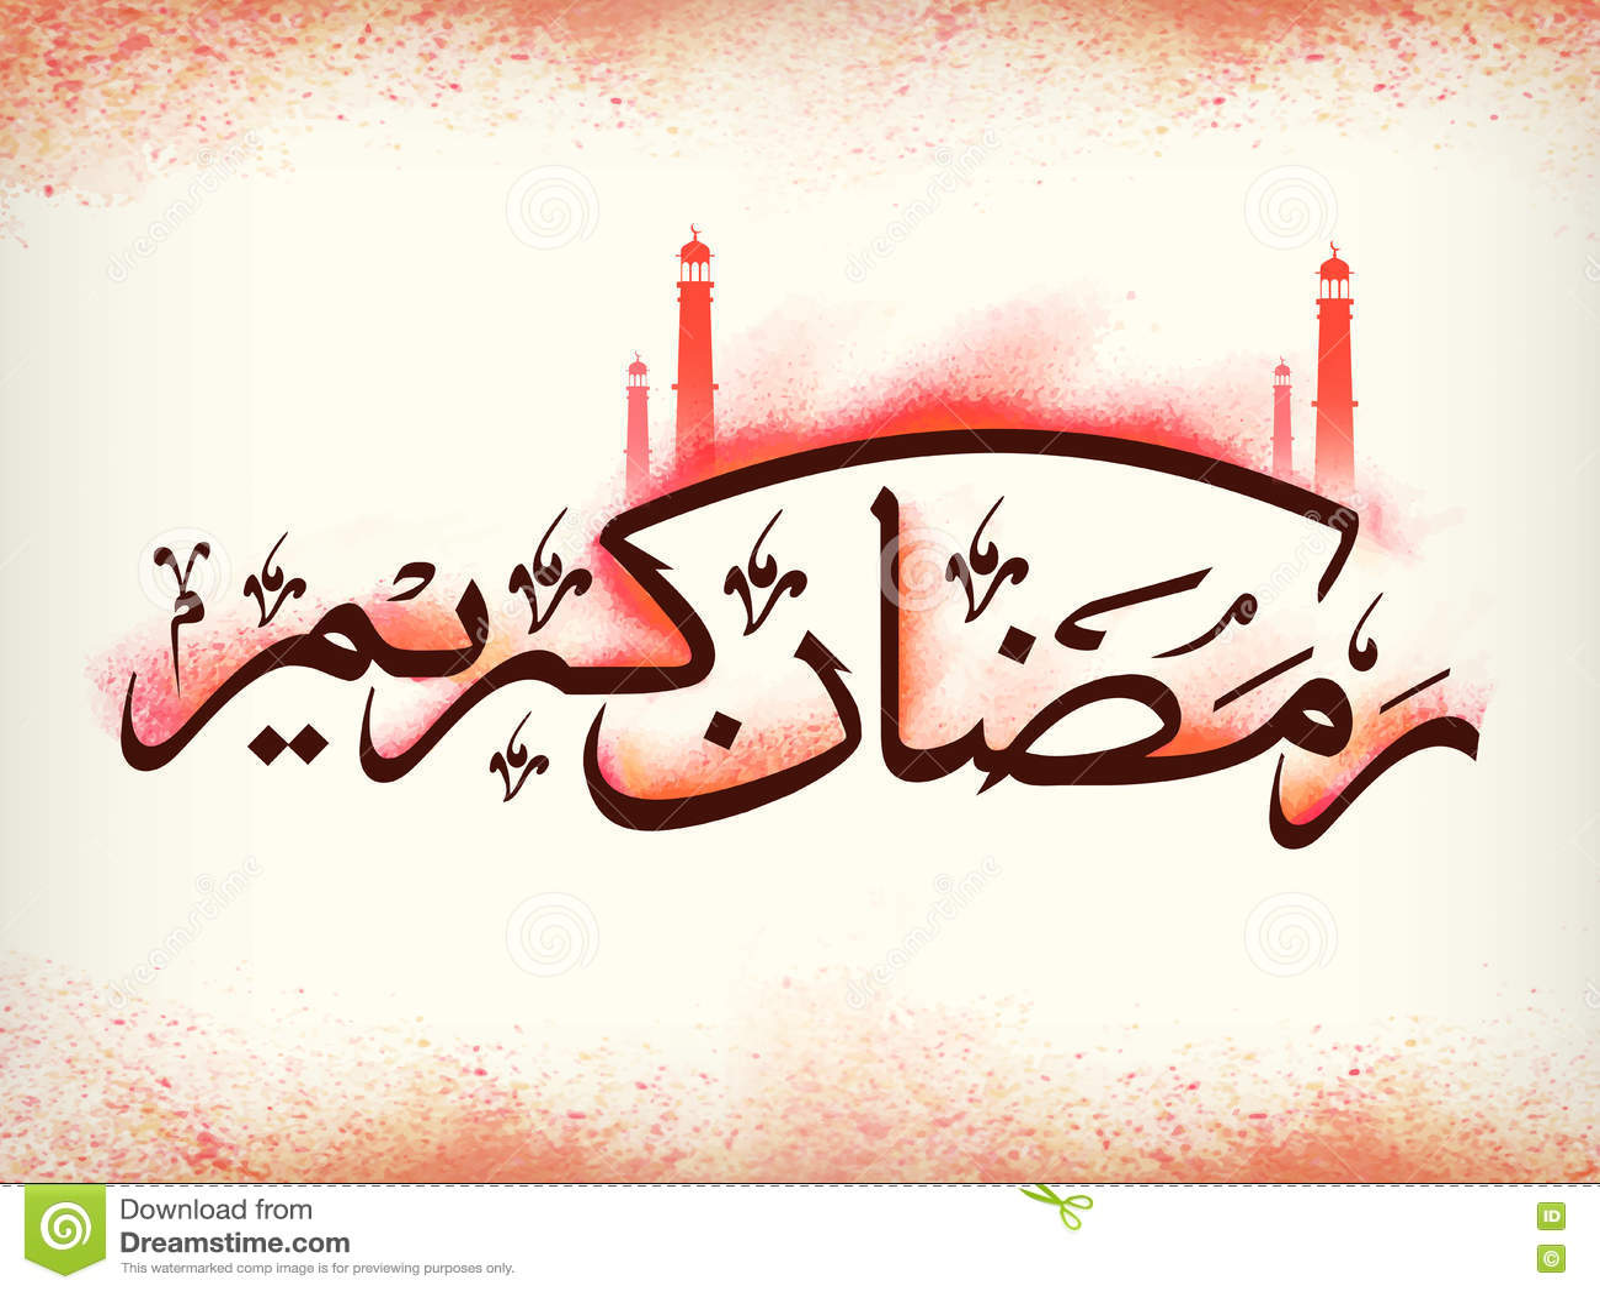 Arabic calligraphy for ramadan kareem stock illustration